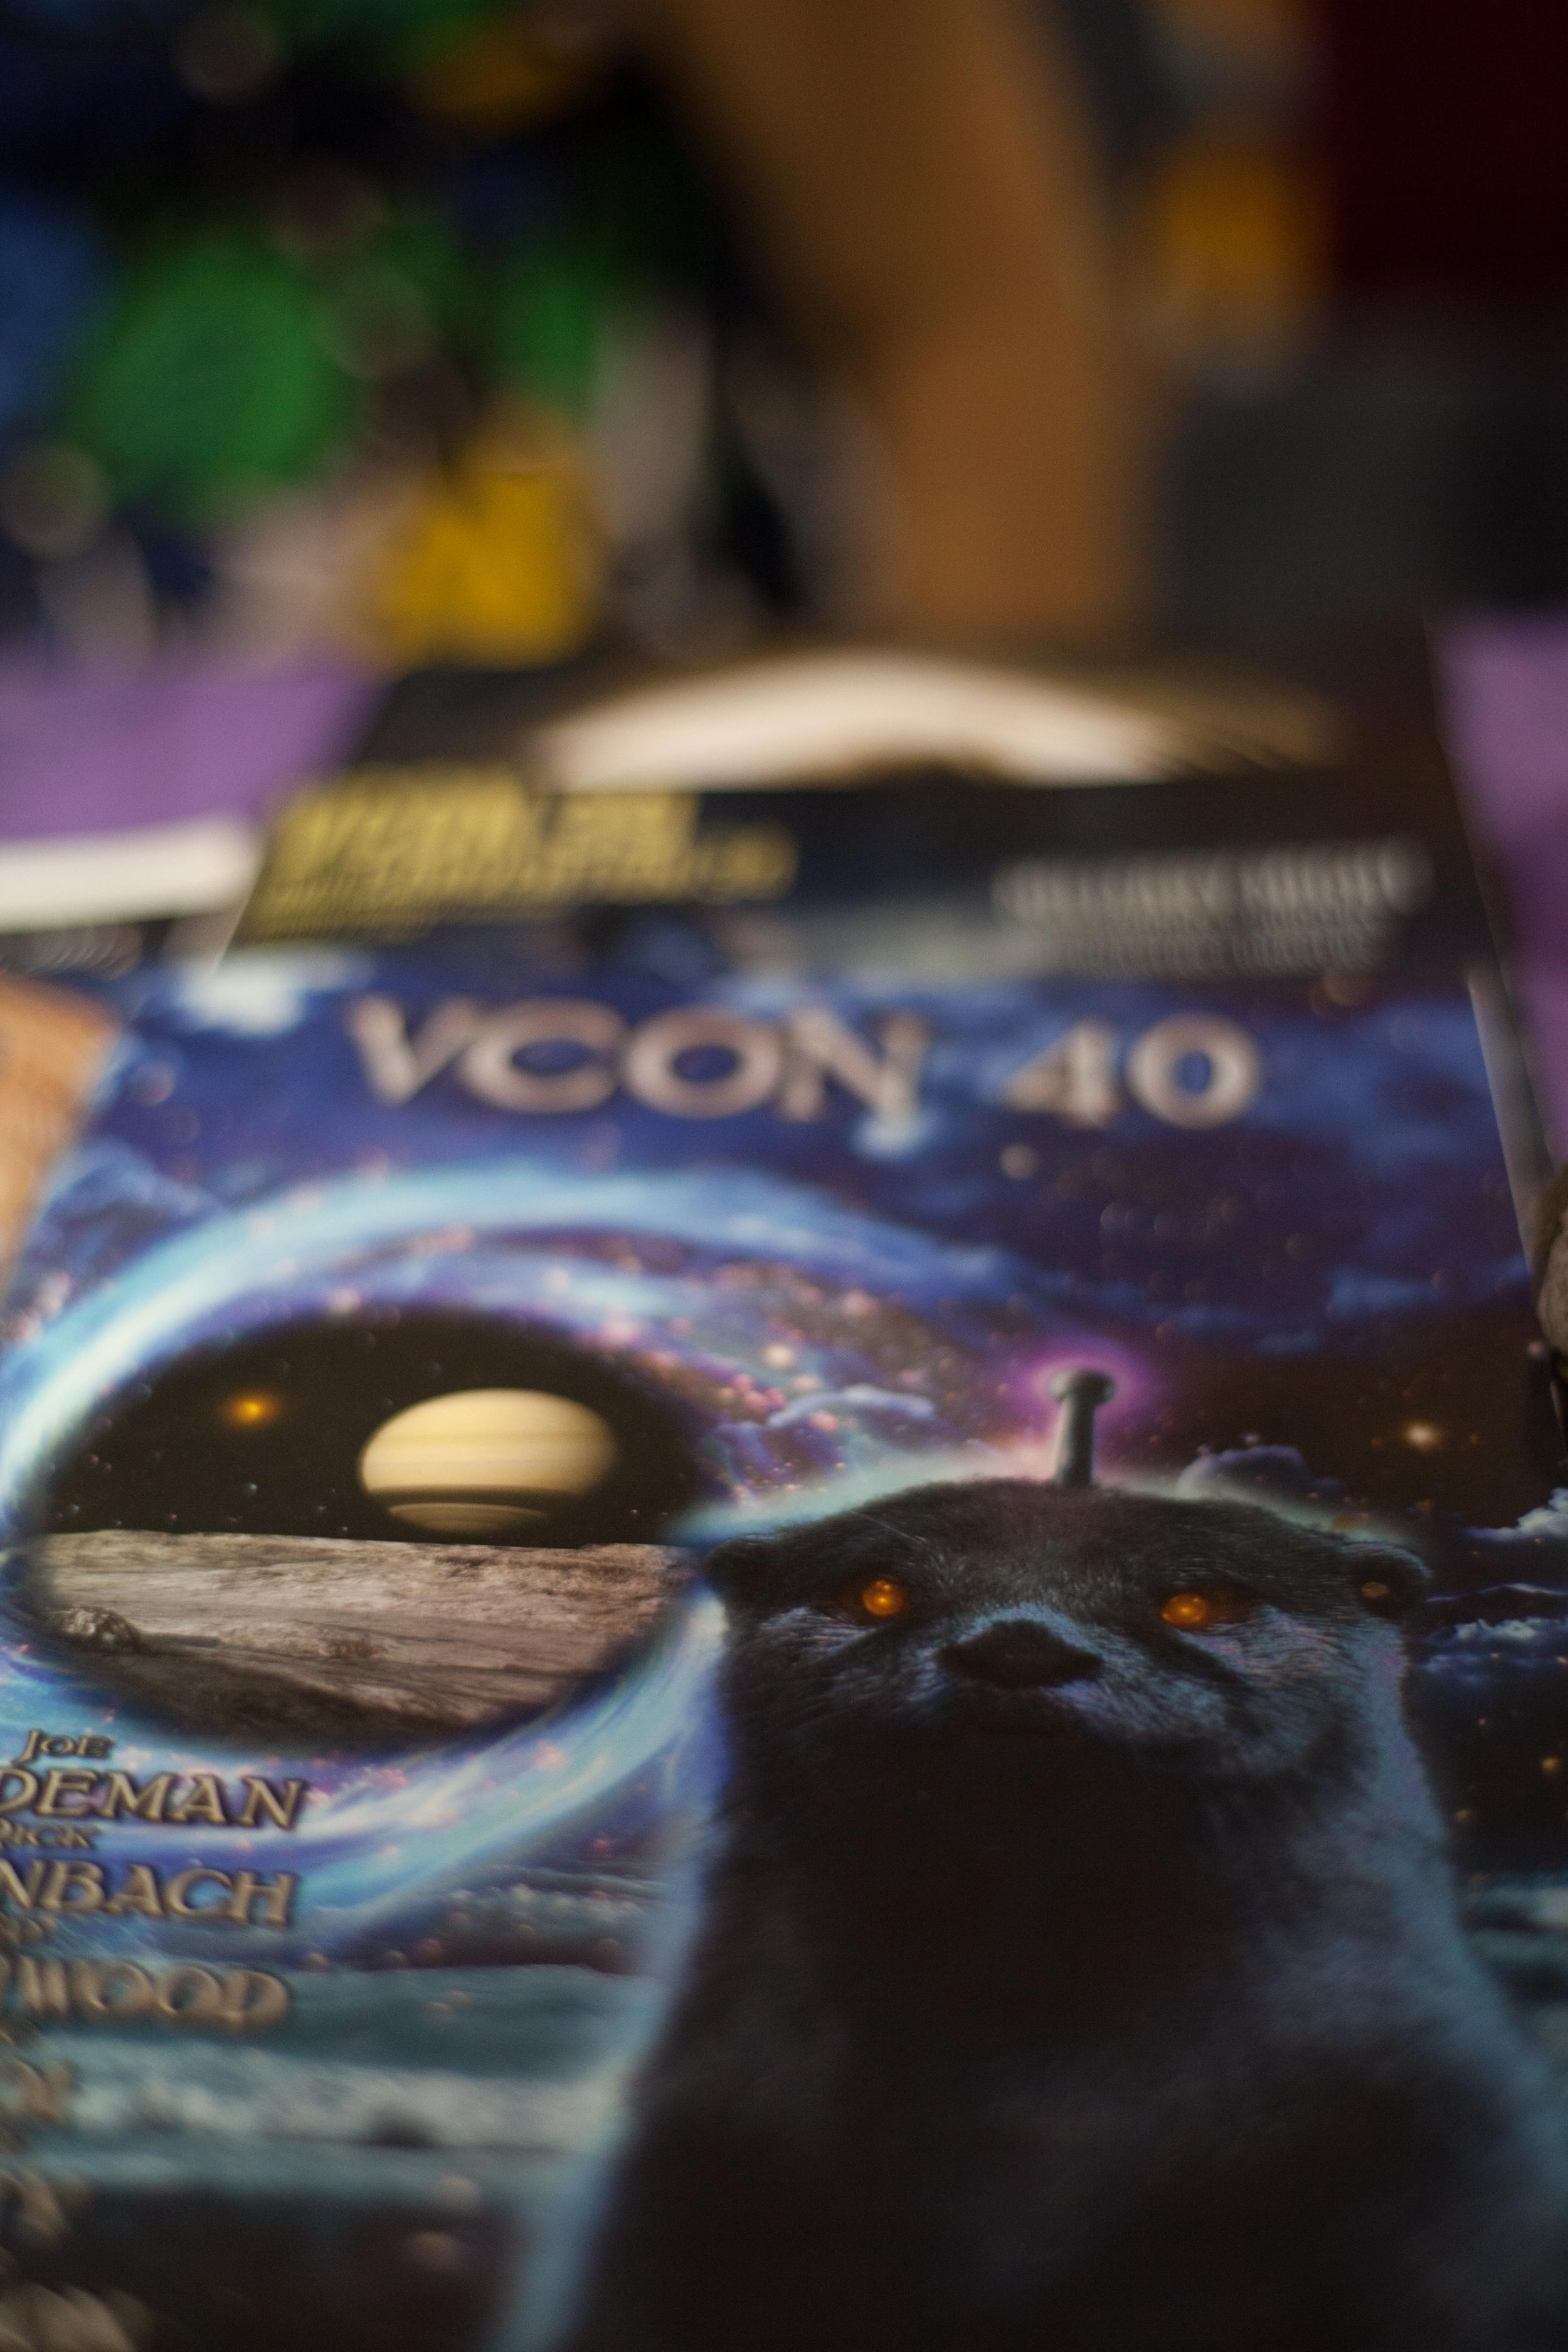 VCON, Vancouver's premier sci-fi, fantasy and games convention.